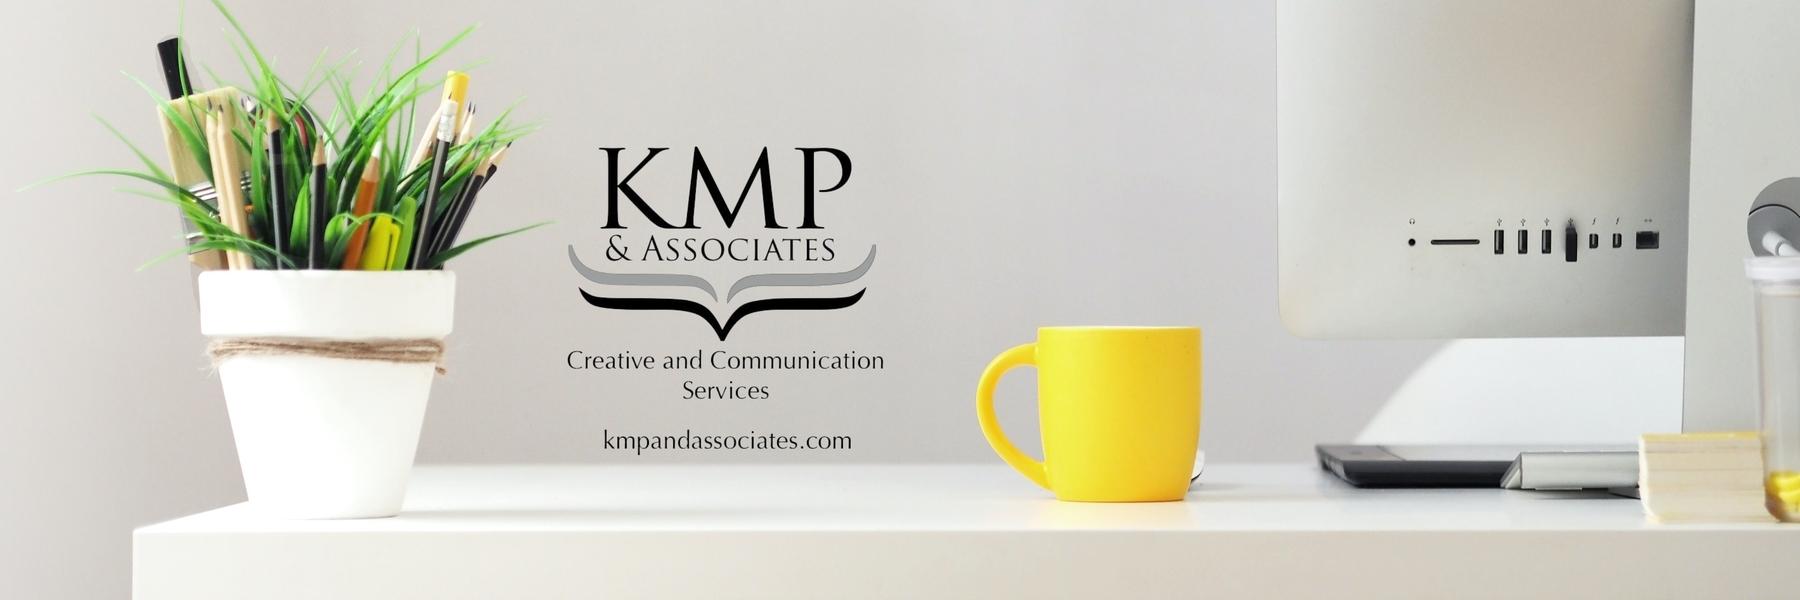 KMP & Associates Creative and Communication Services